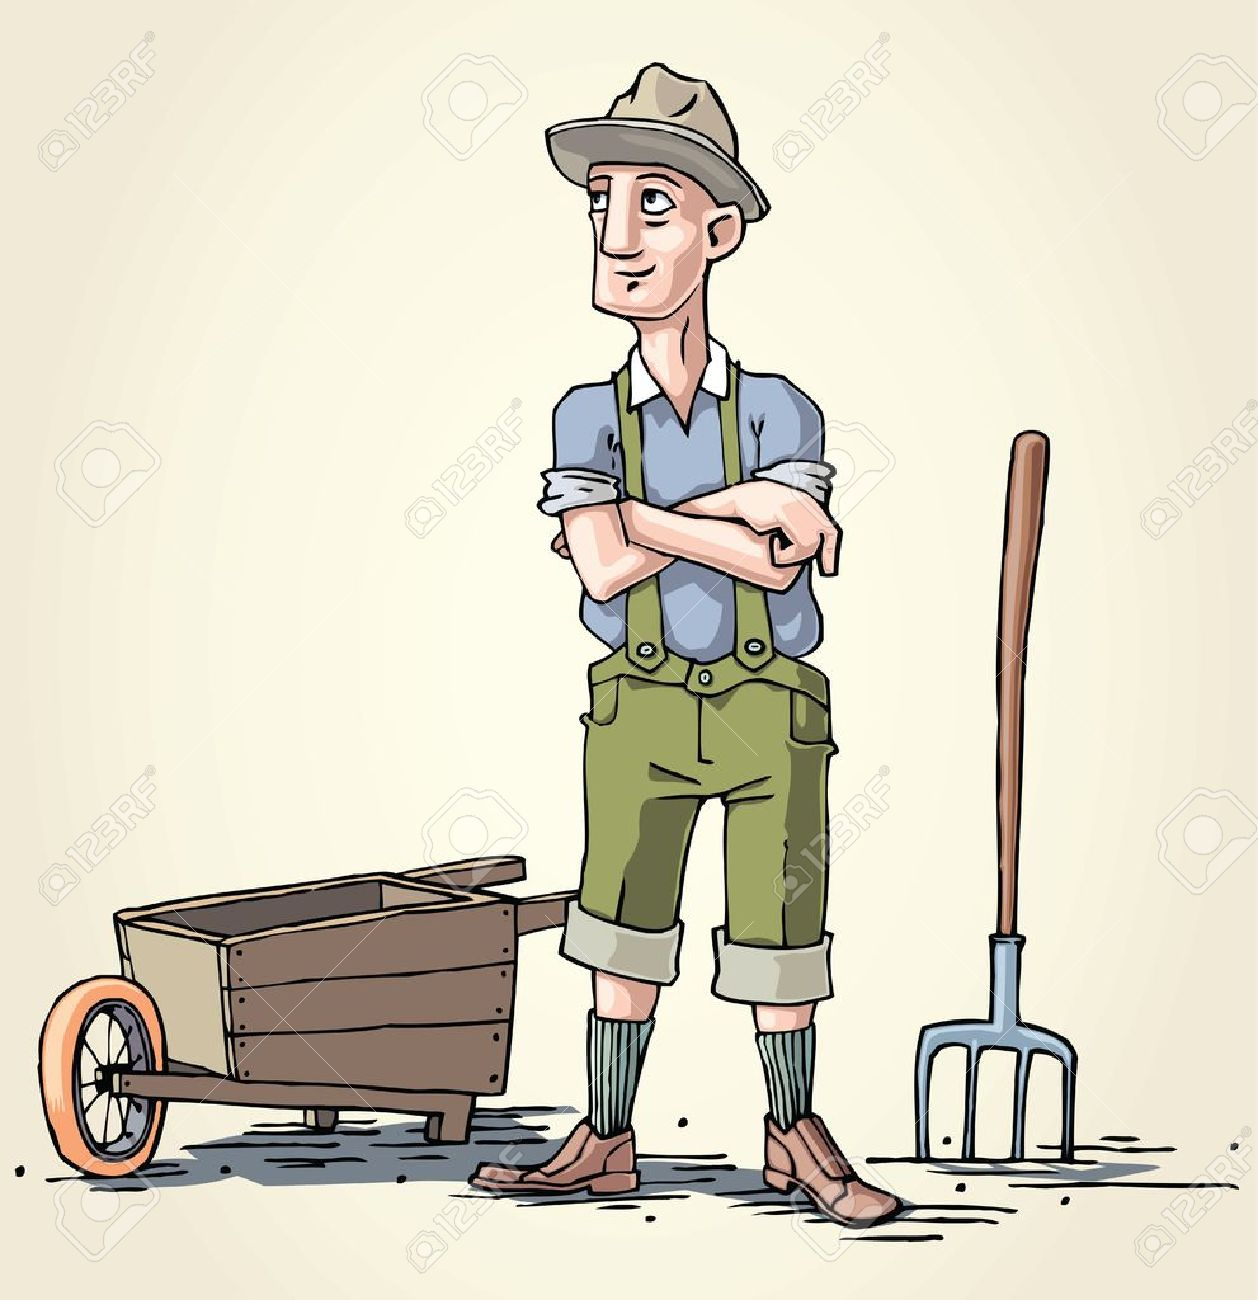 The farmer and his wheelbarrow. Stock Vector - 10222412